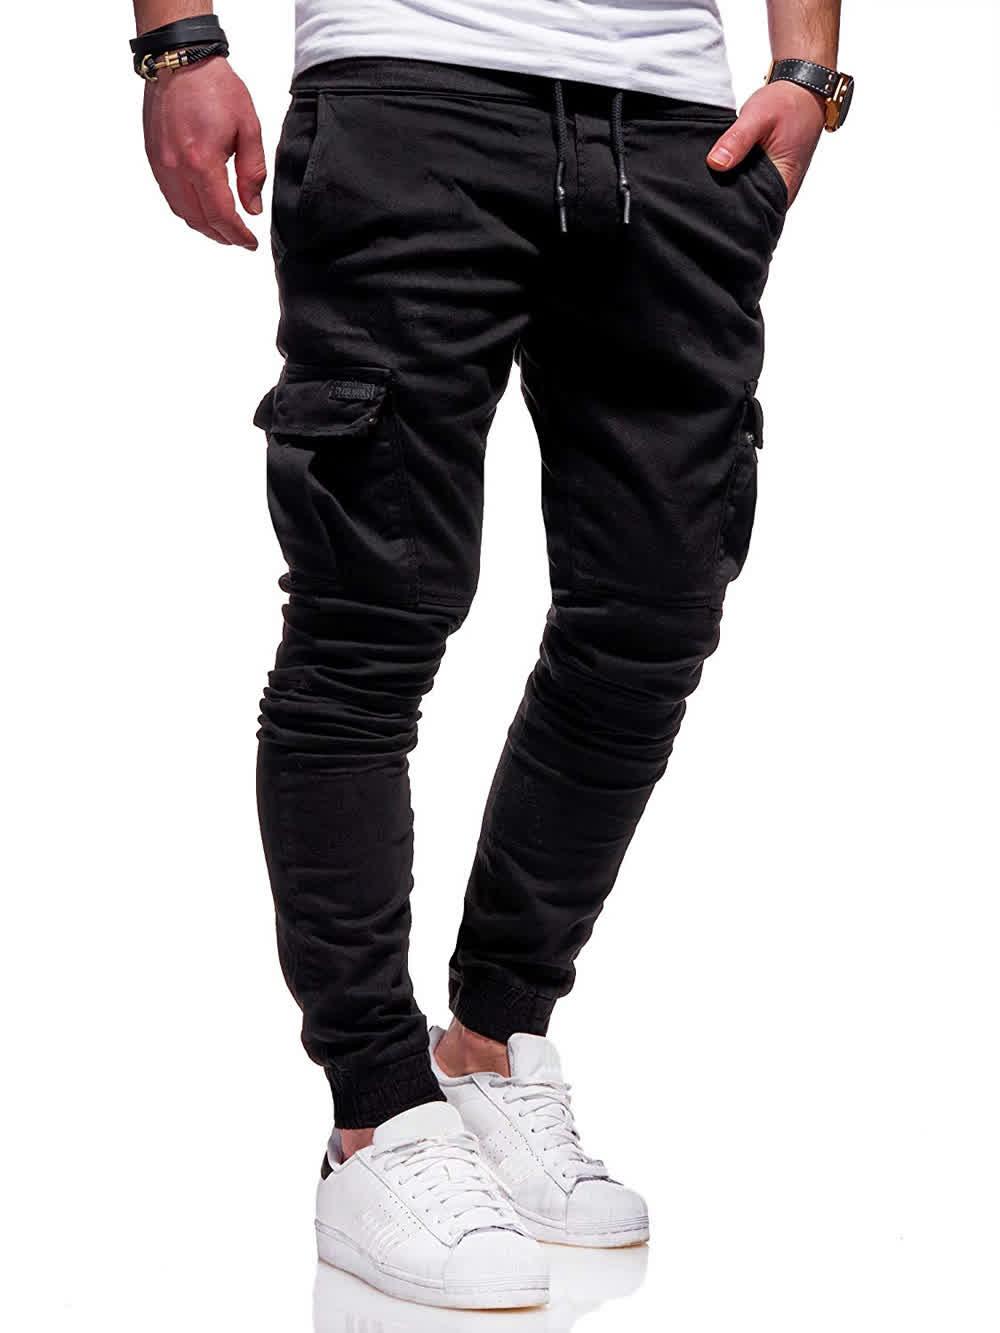 Men Solid Color Slacks Sports Pants